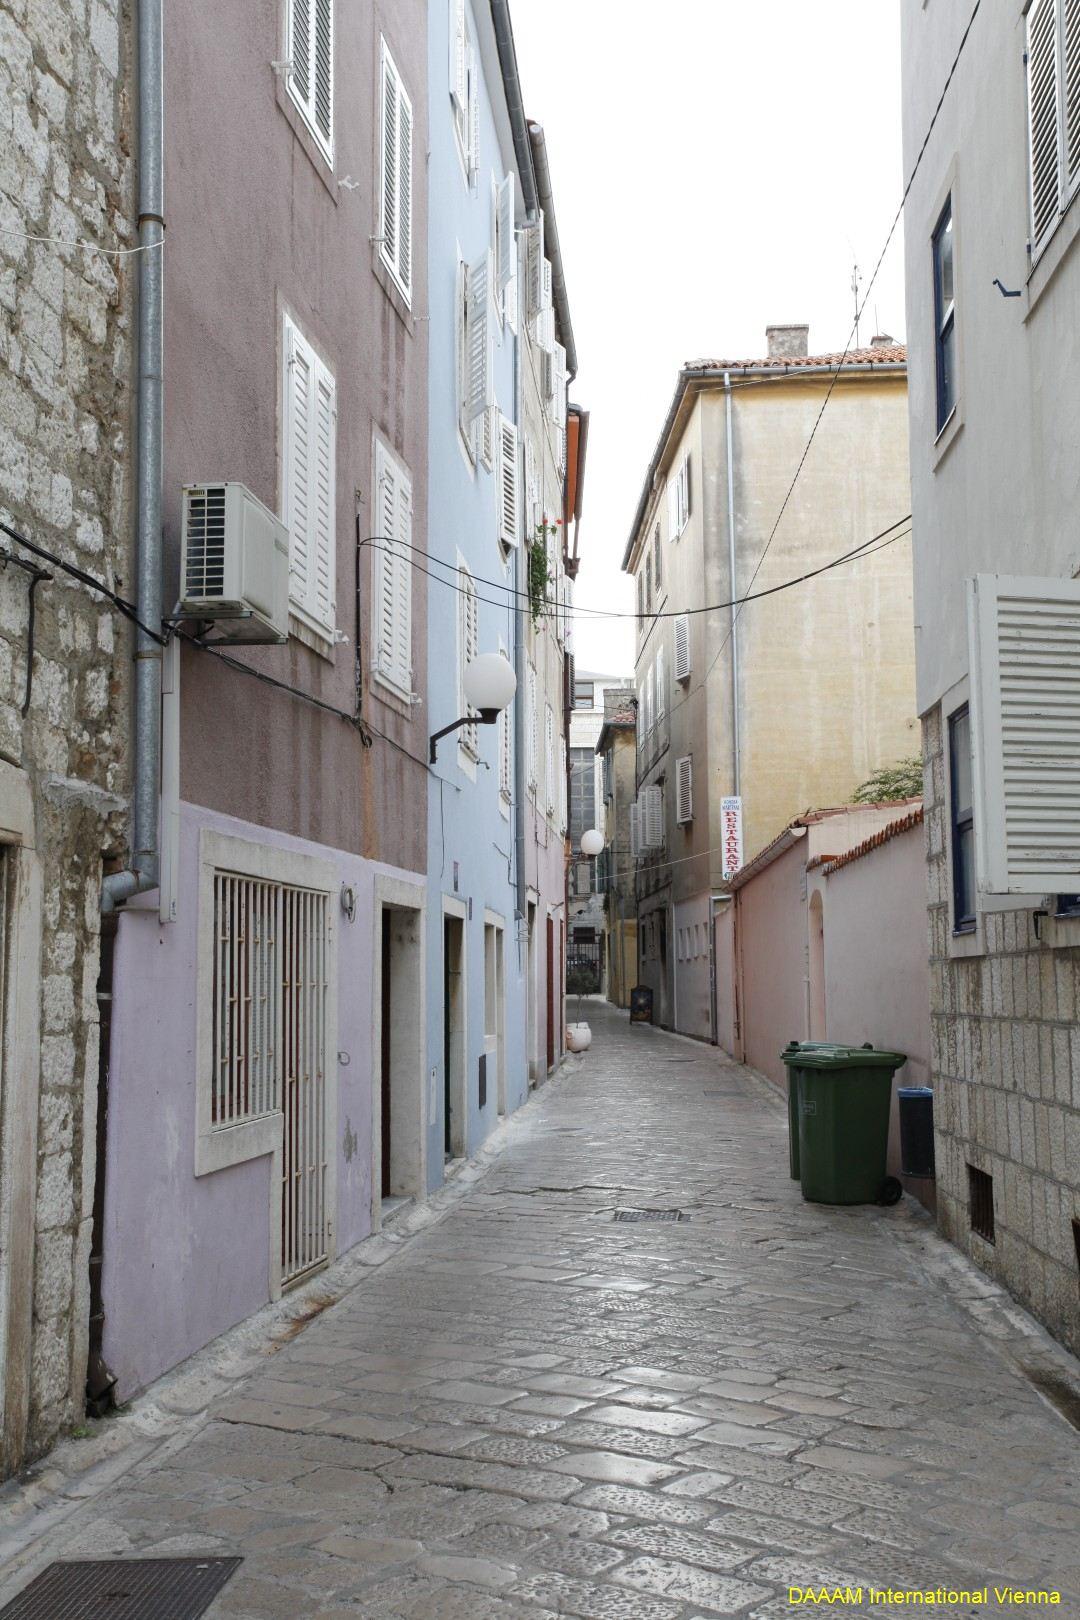 DAAAM_2012_Zadar_00_Zadar_City_047